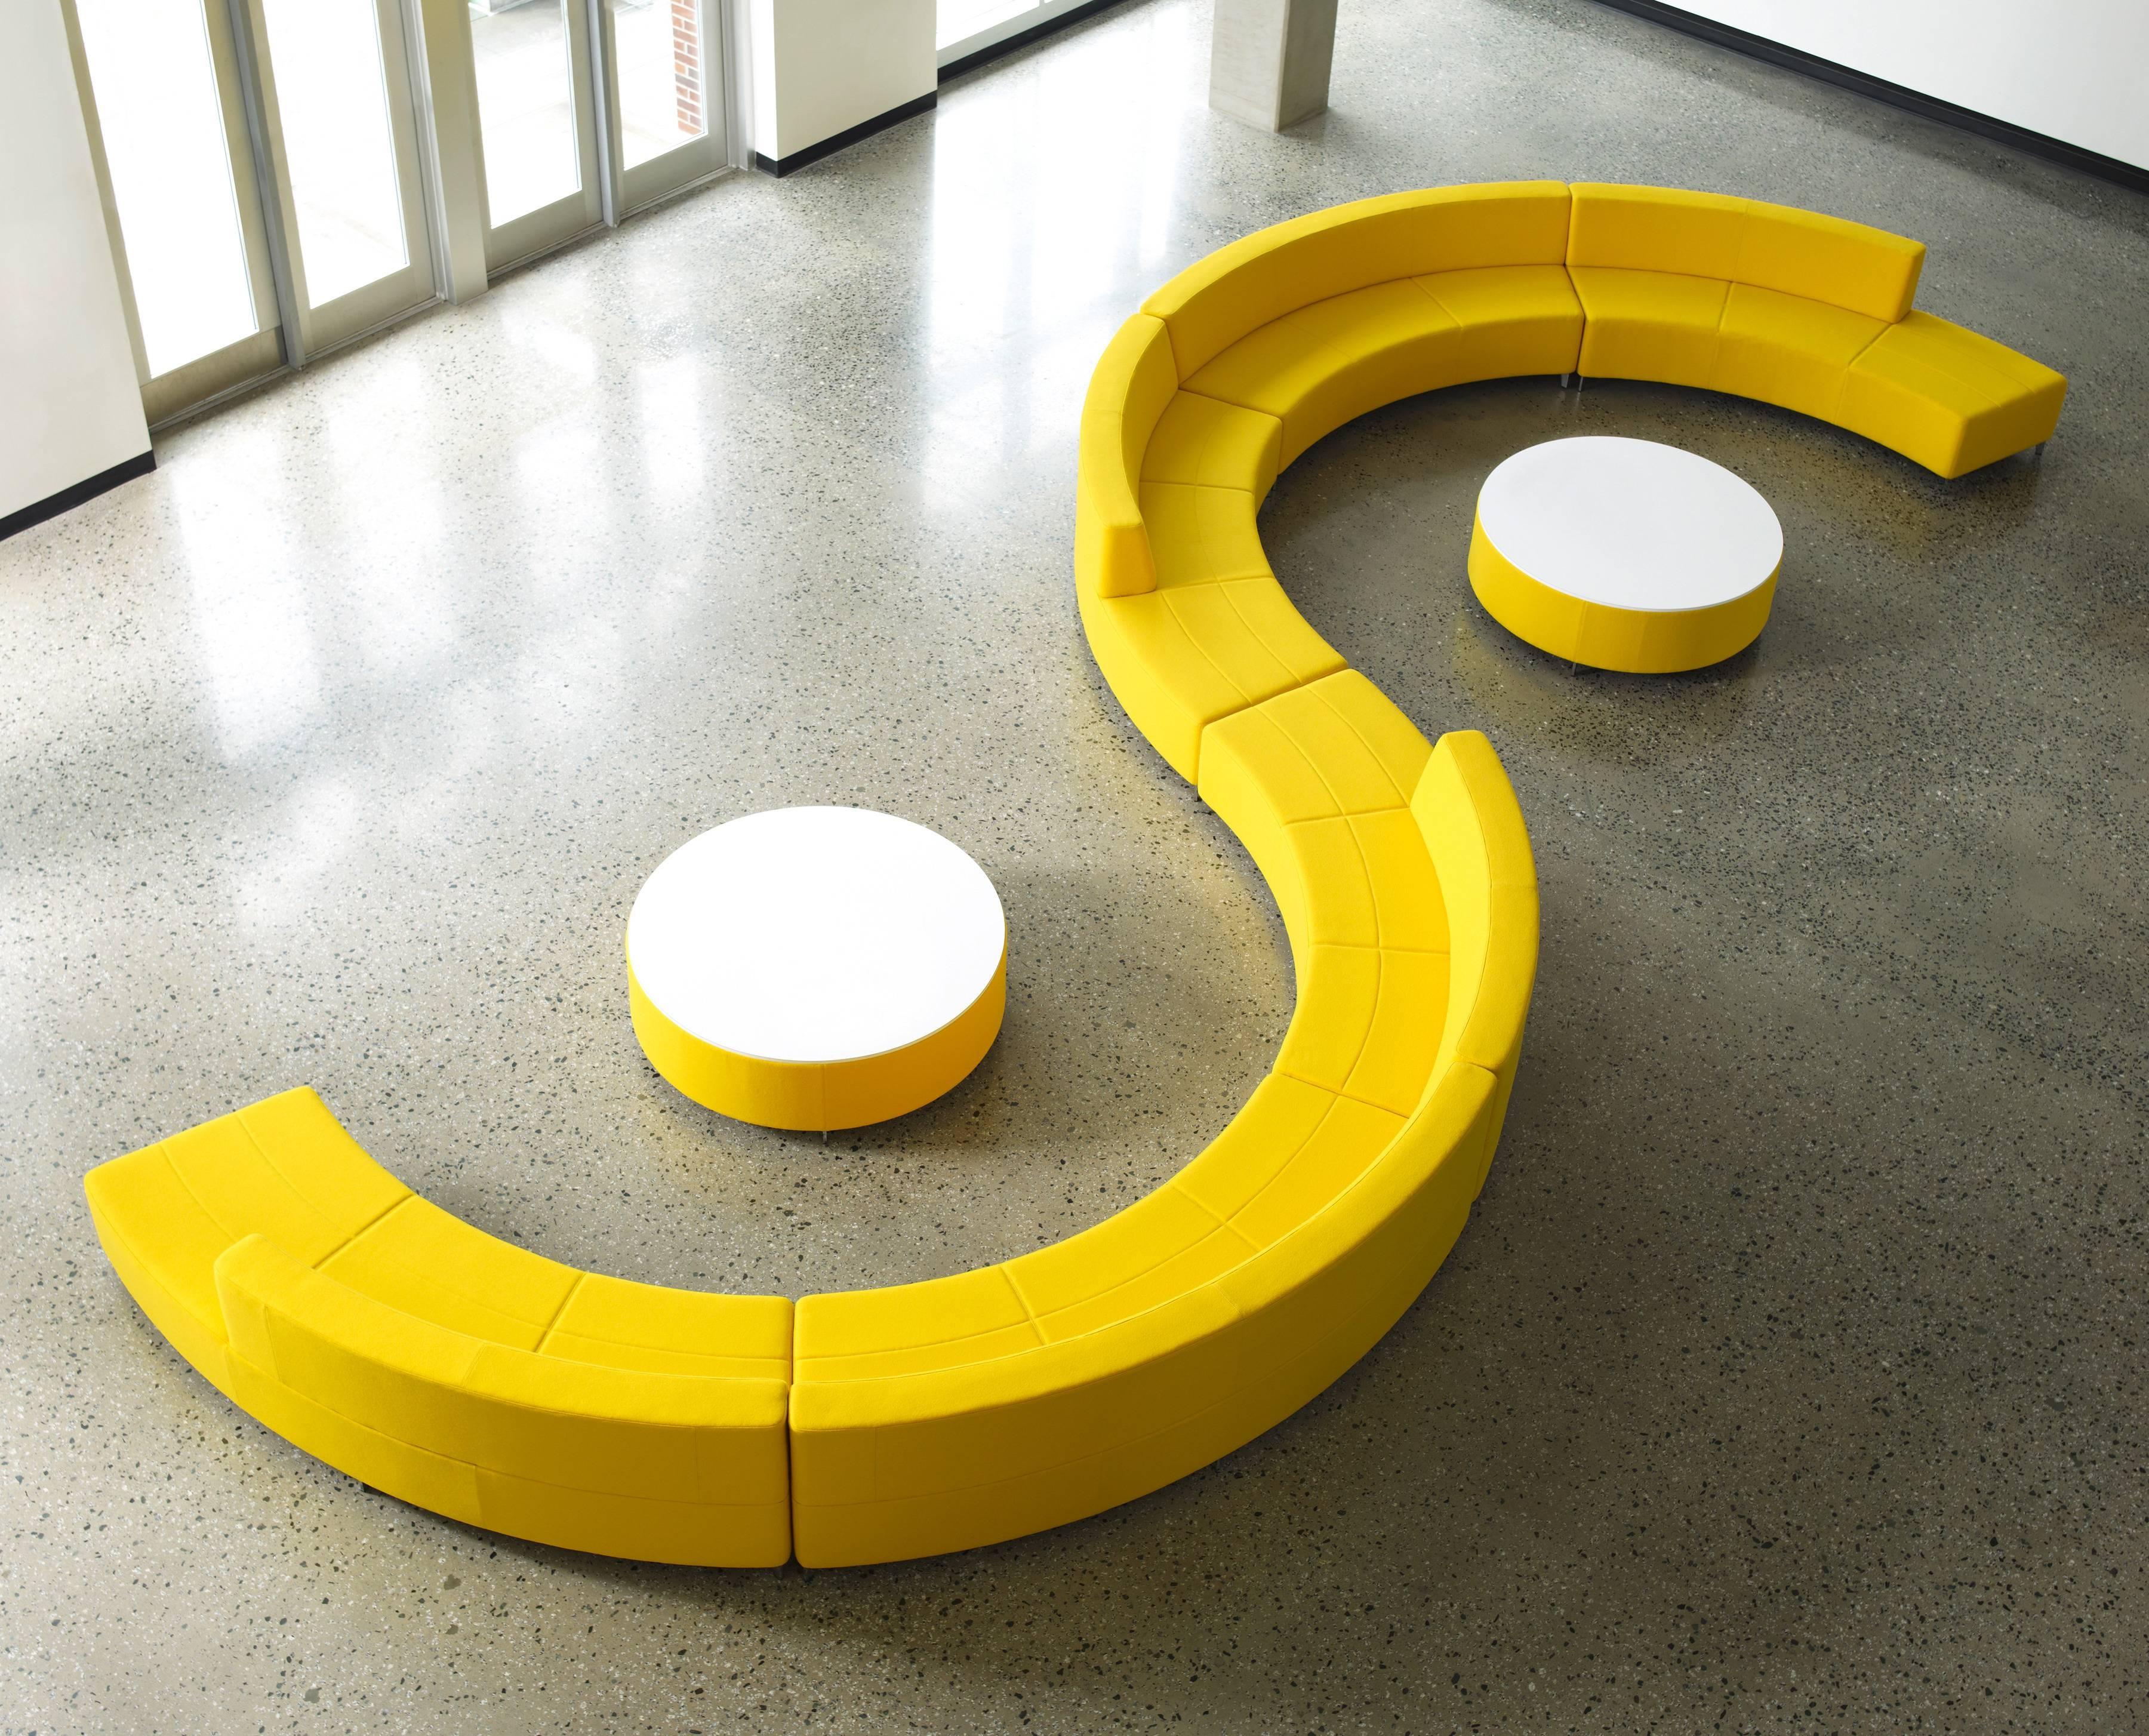 Davis Furniture - Kontour with regard to Davis Sofas (Image 5 of 15)